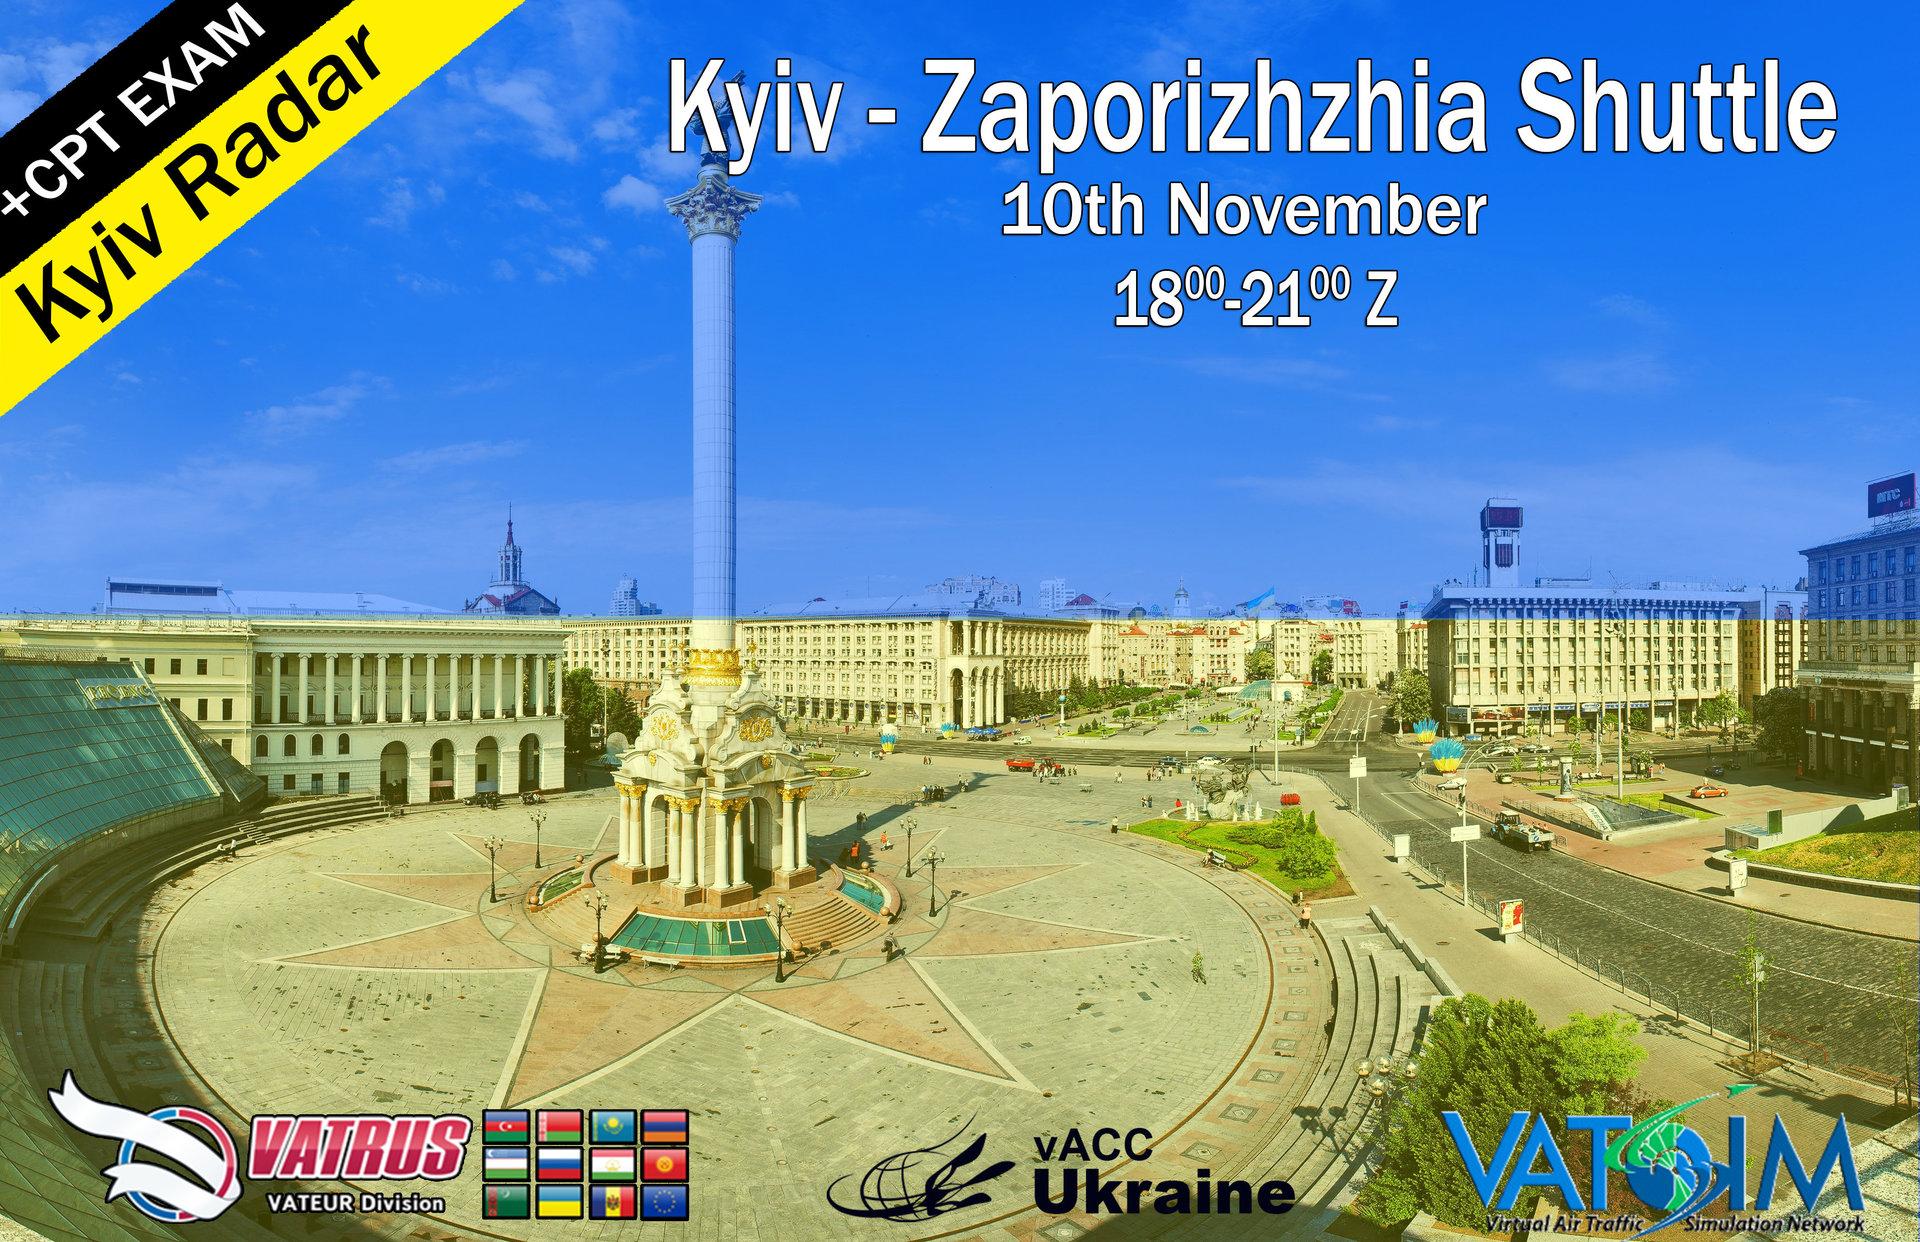 981461978_Kyiv-ZaporizhzhiaShuttle.thumb.jpg.d3cbd6601a52d991947c5f666b2b75df.jpg